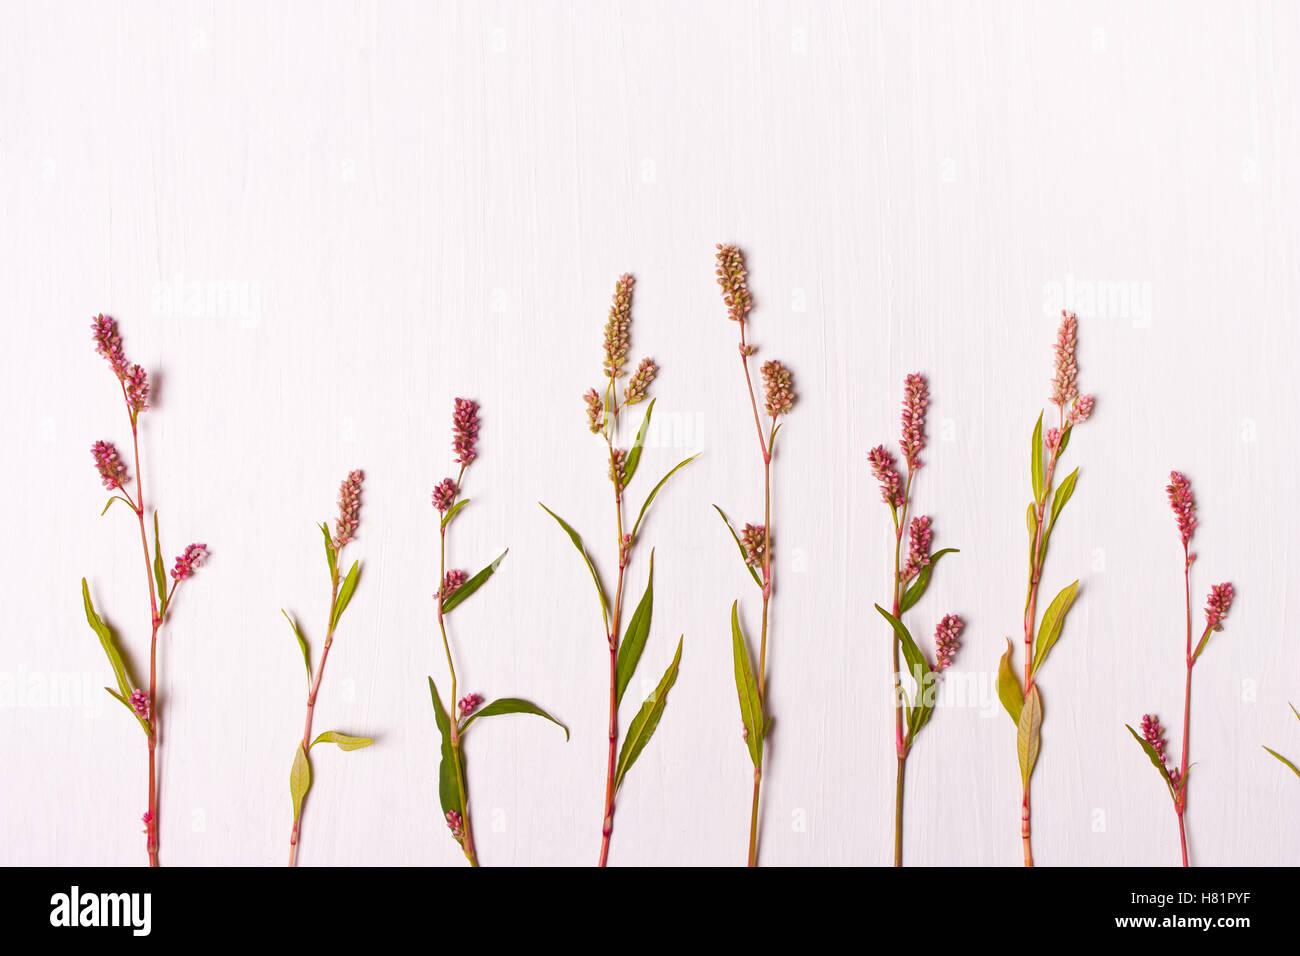 Blumenmuster. Flach legen, Top Aussicht. Natur-Konzept. Stockbild